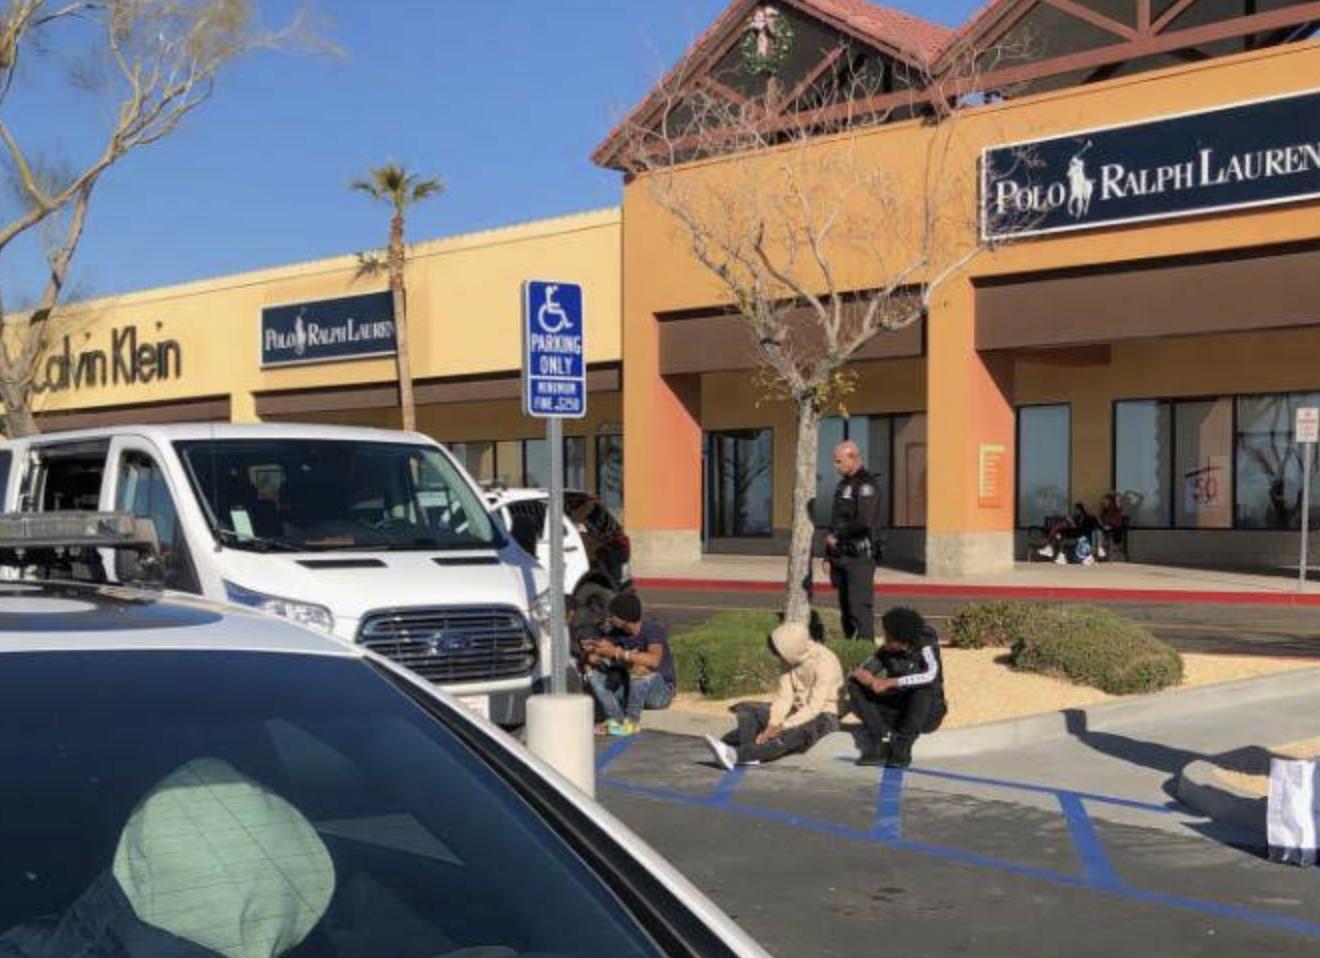 barstow shoplifting teens arrested